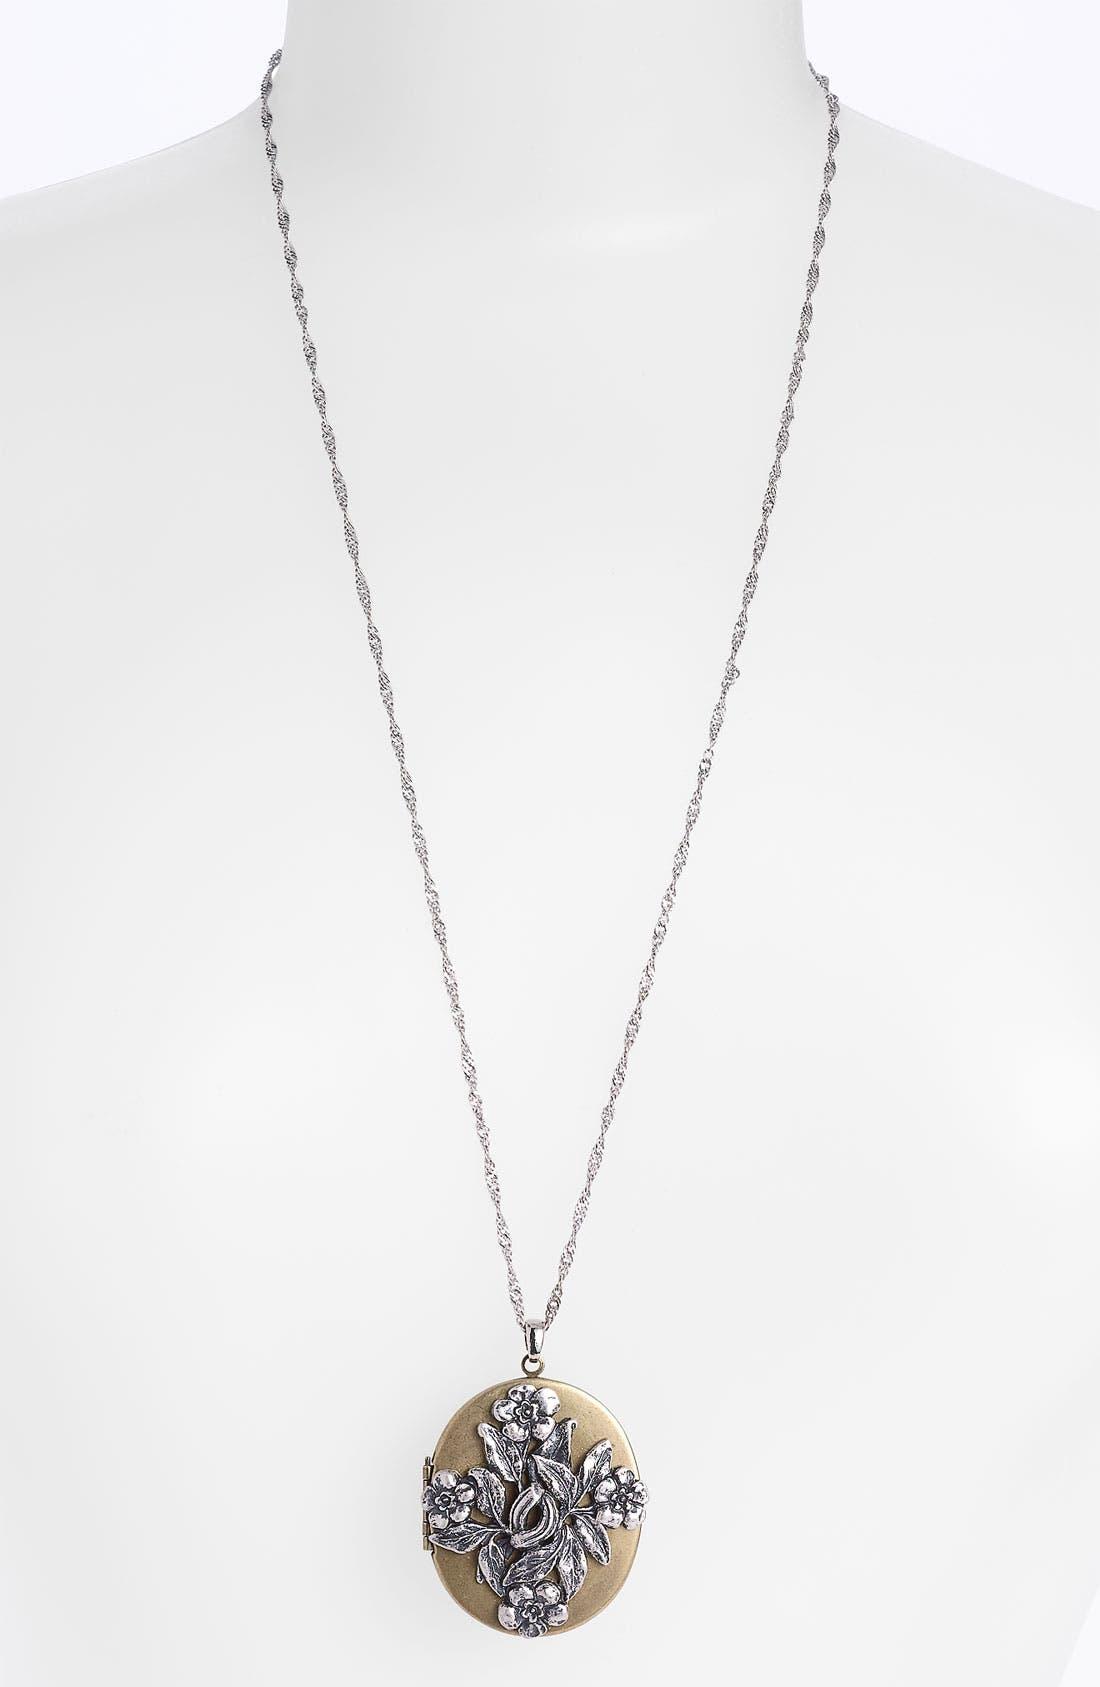 Main Image - Nordstrom 'Romantics' Locket Necklace